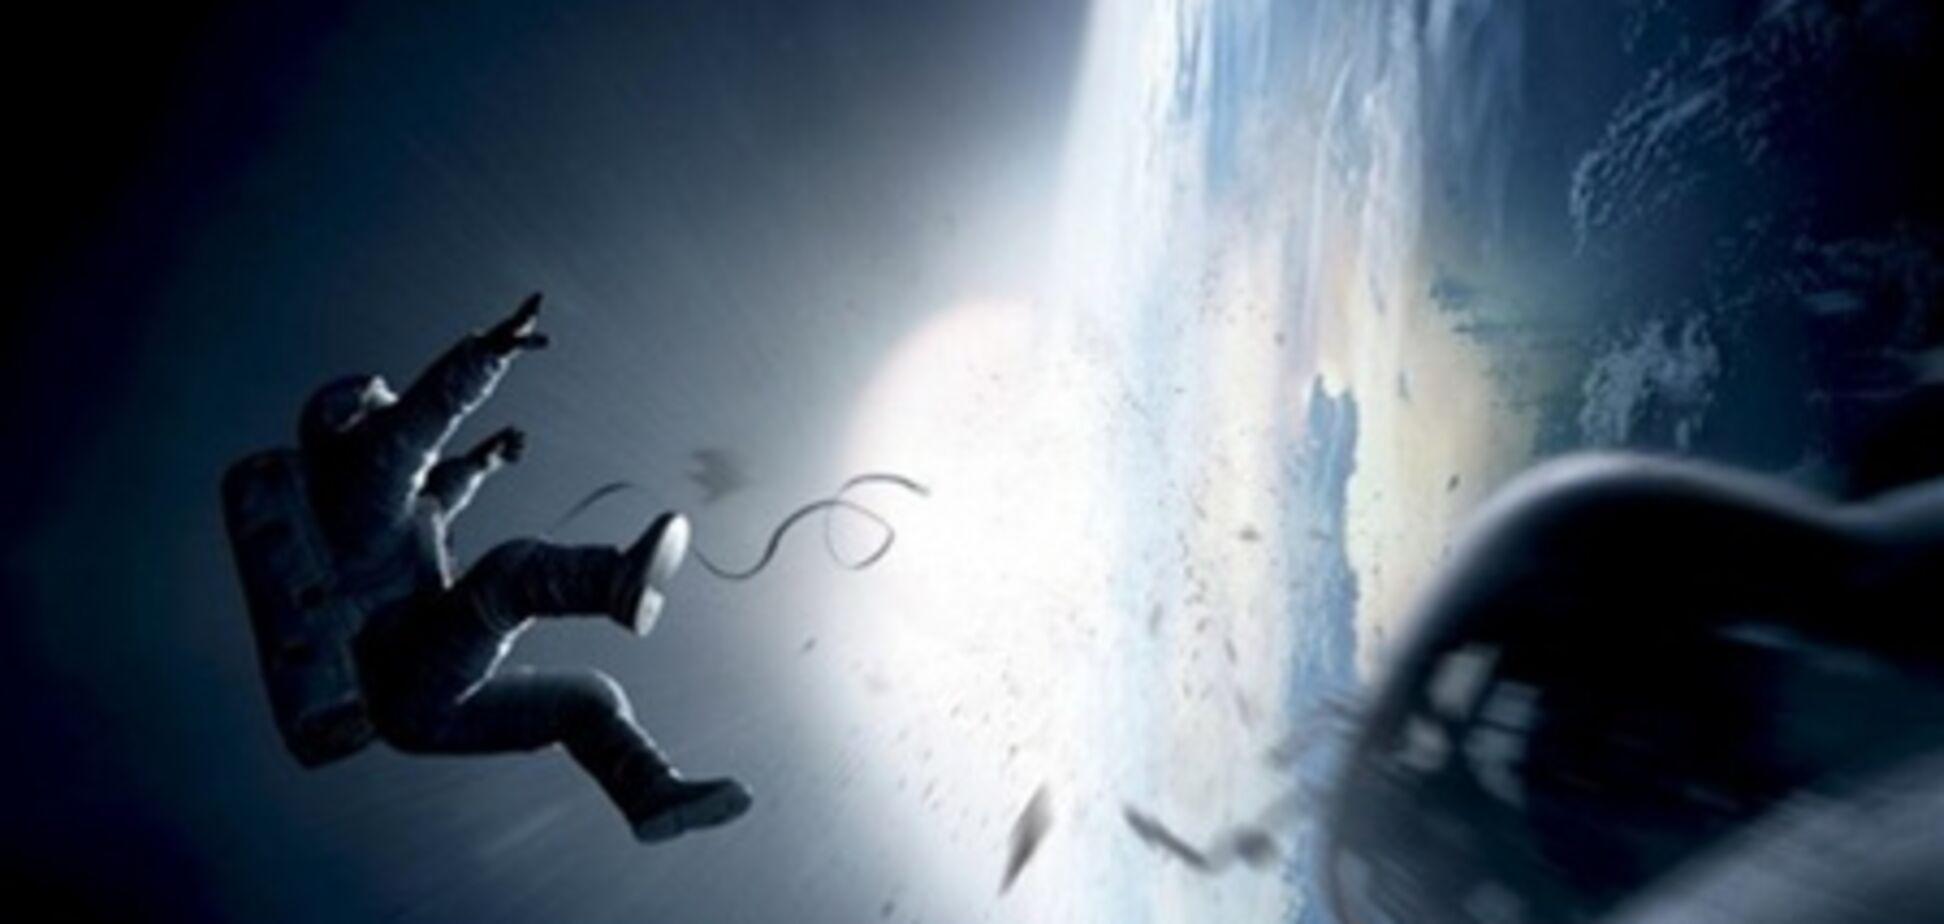 'Гравитация' с Джорджем Клуни и Сандрой Баллок